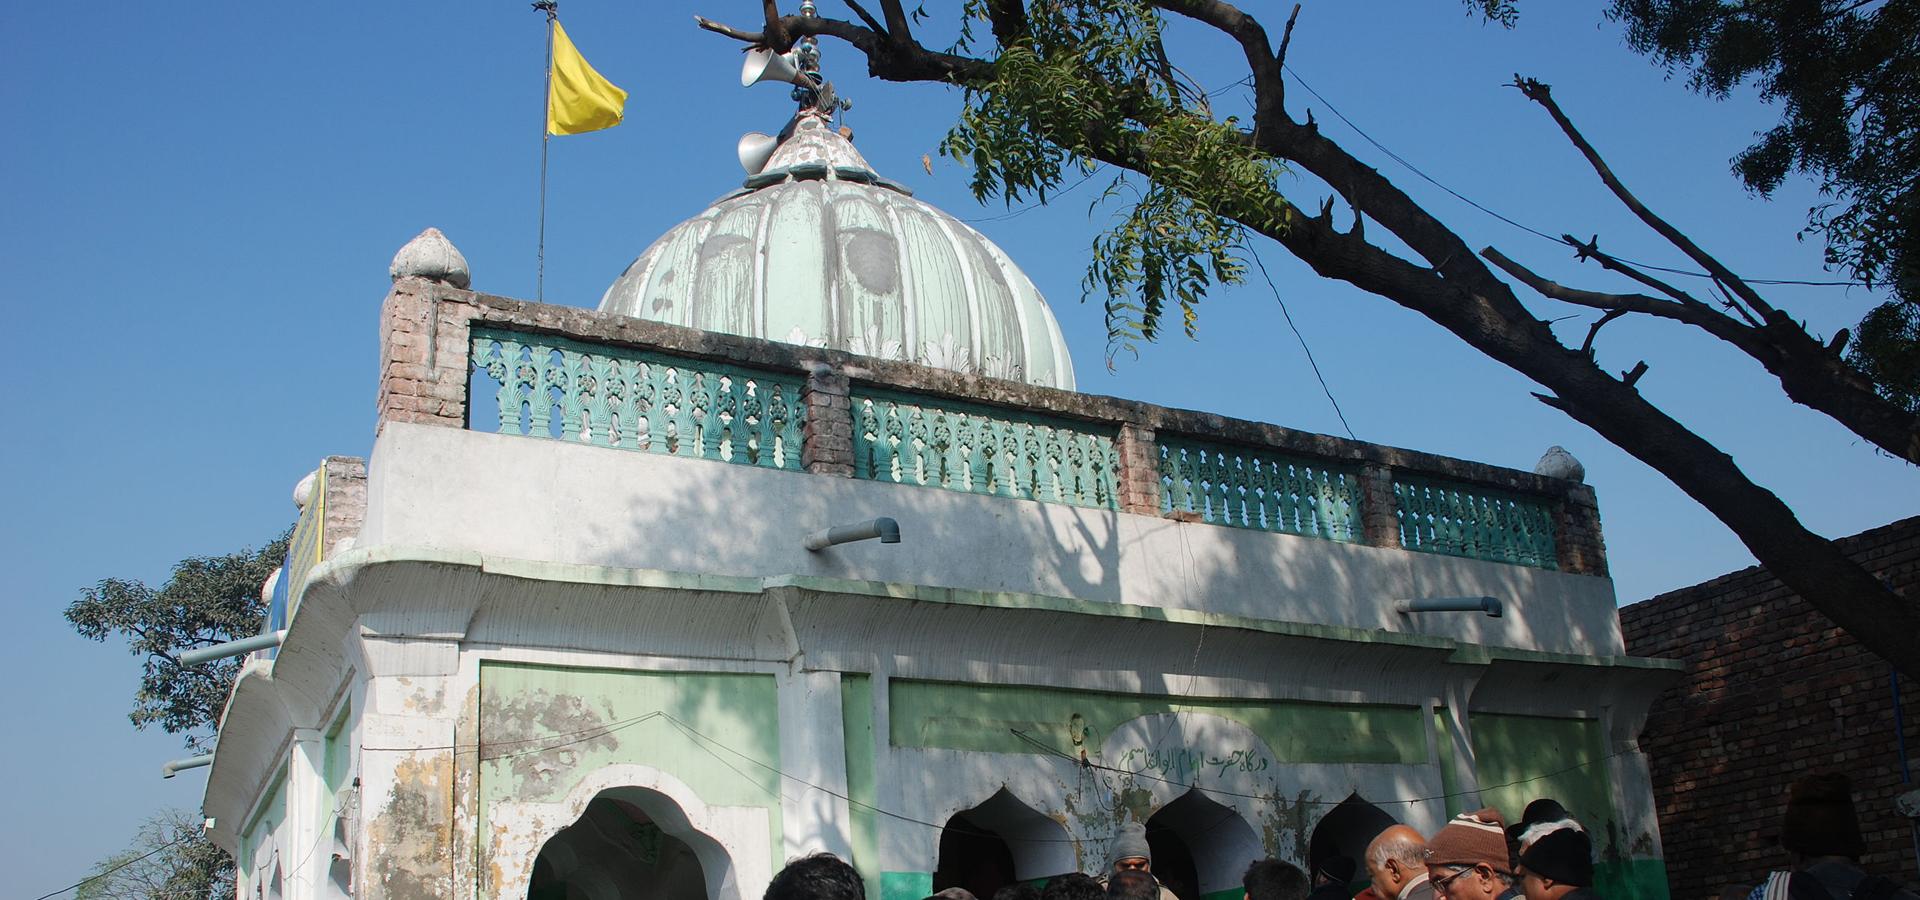 Peer-to-peer advisory in Panipat, Haryana, India